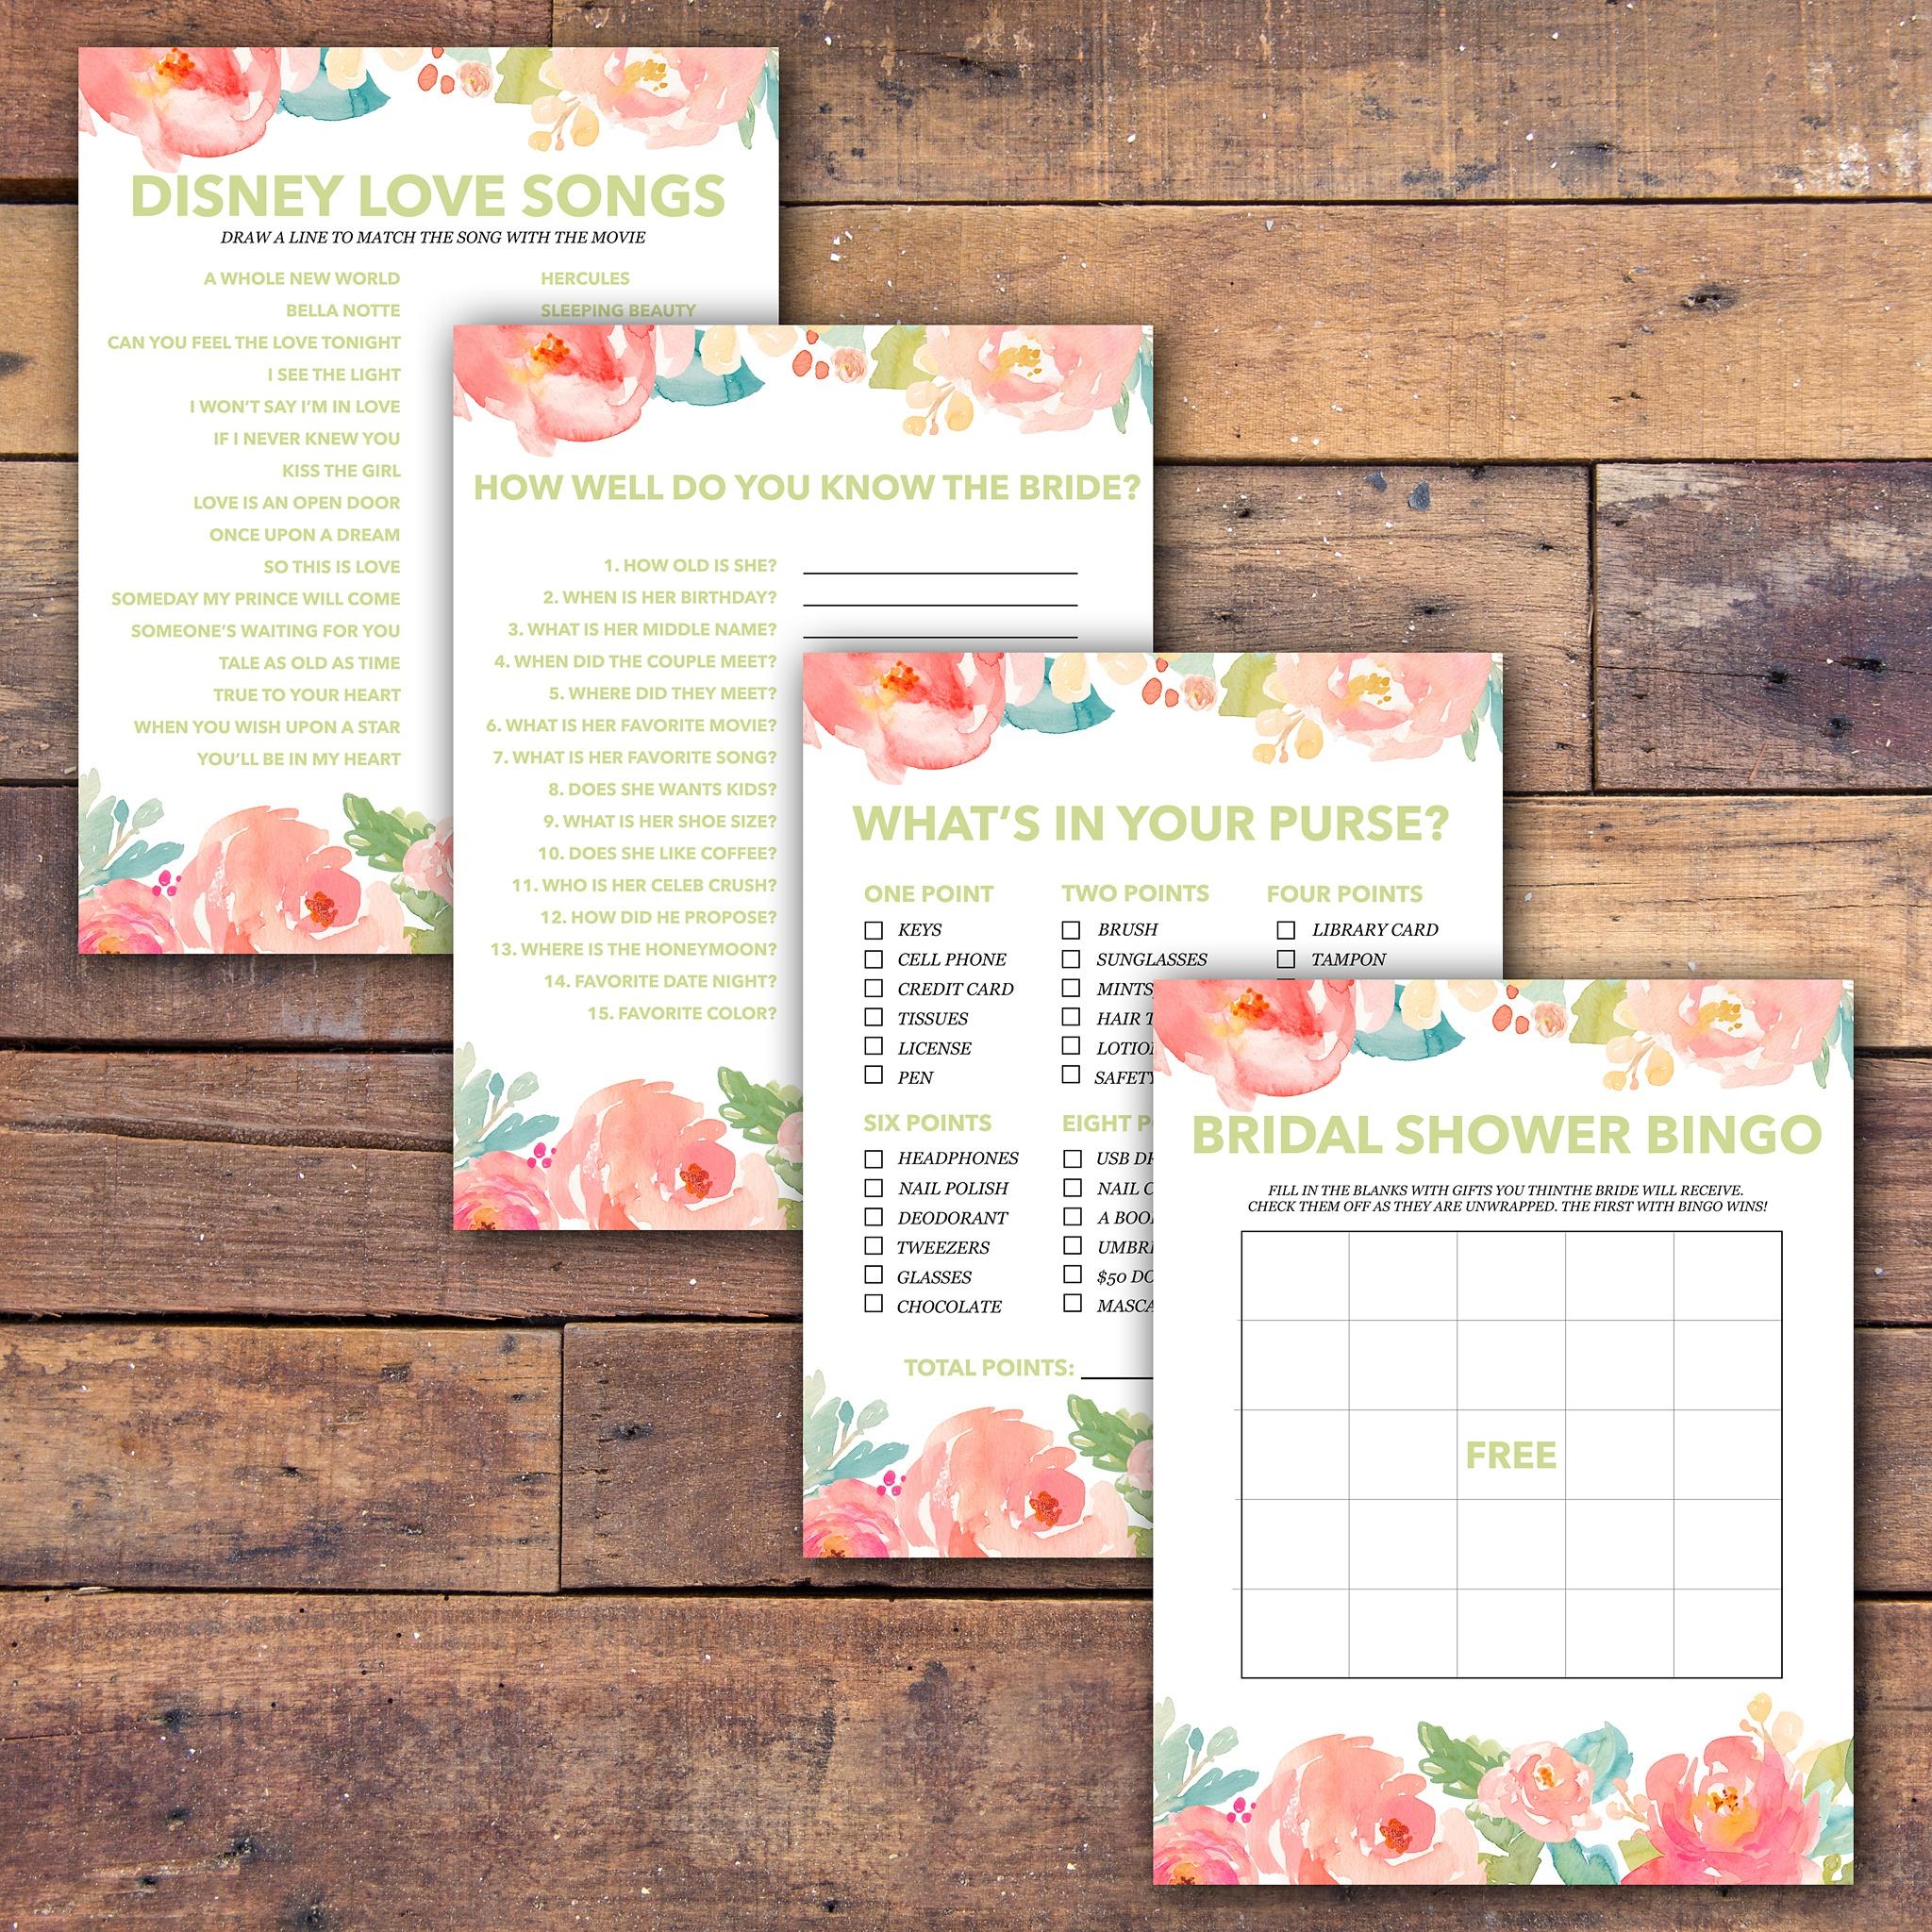 Bridal Shower Games Free Printable - - Samantha Jean Photograhy - Free Printable Wedding Shower Games